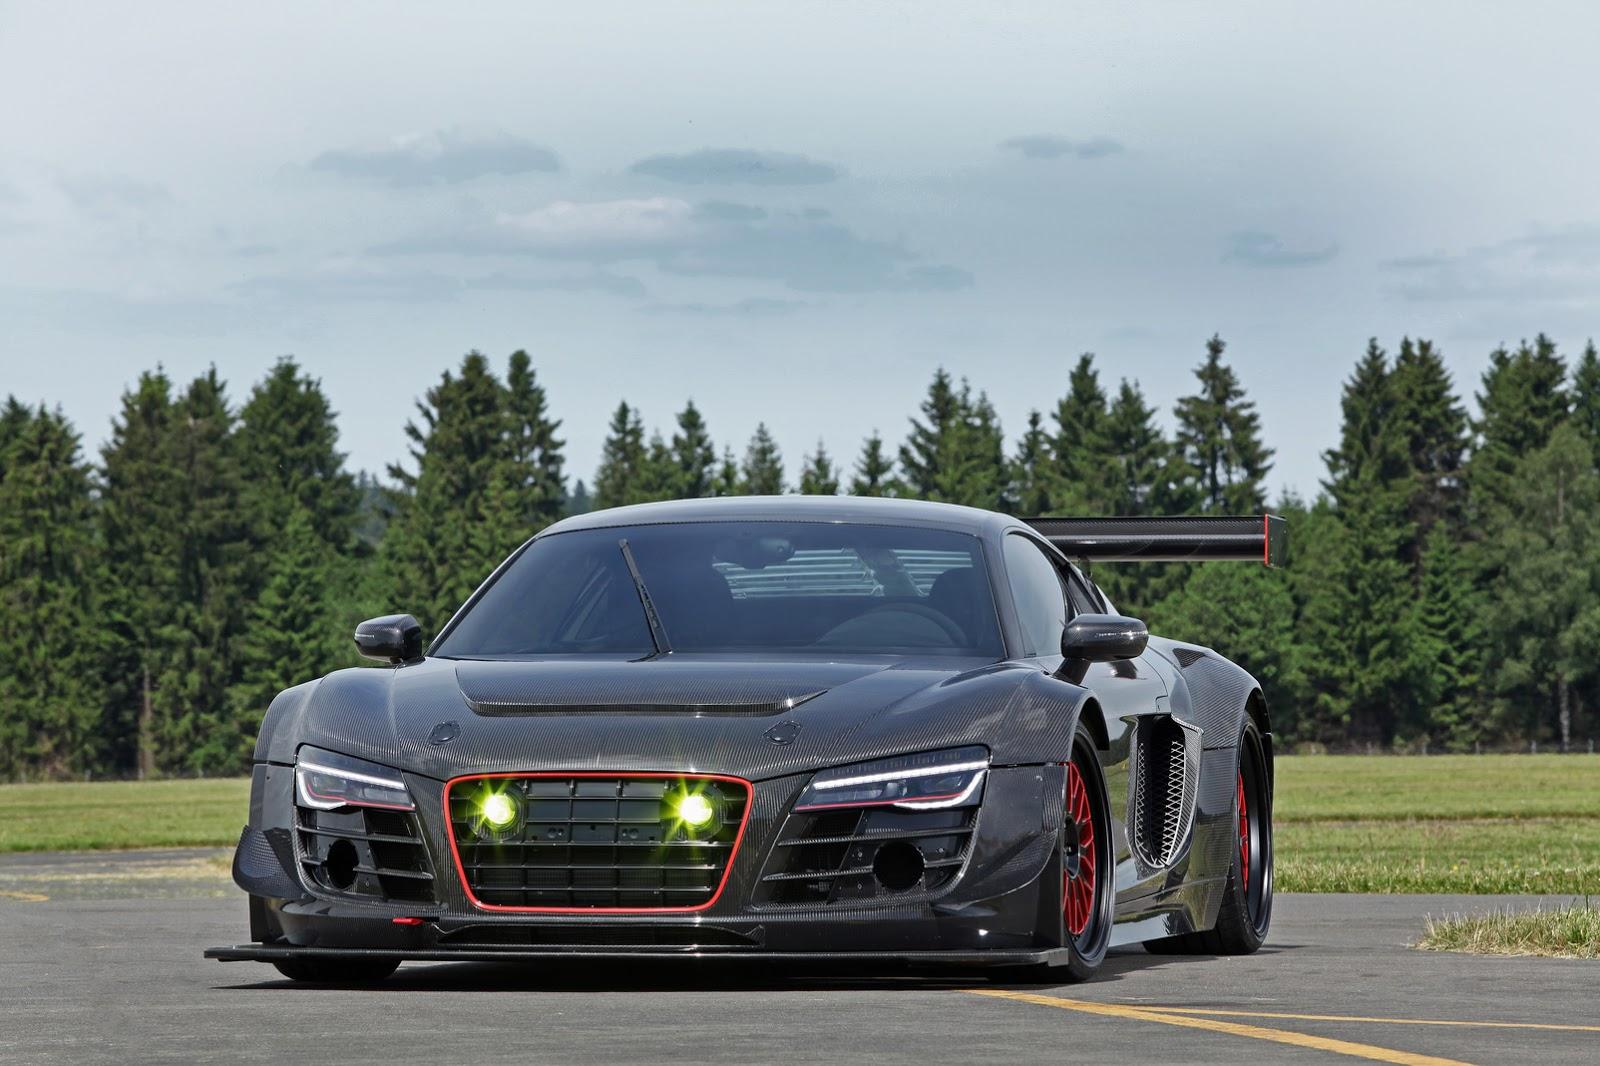 Audi-R8-Recon-MR8-3.jpg